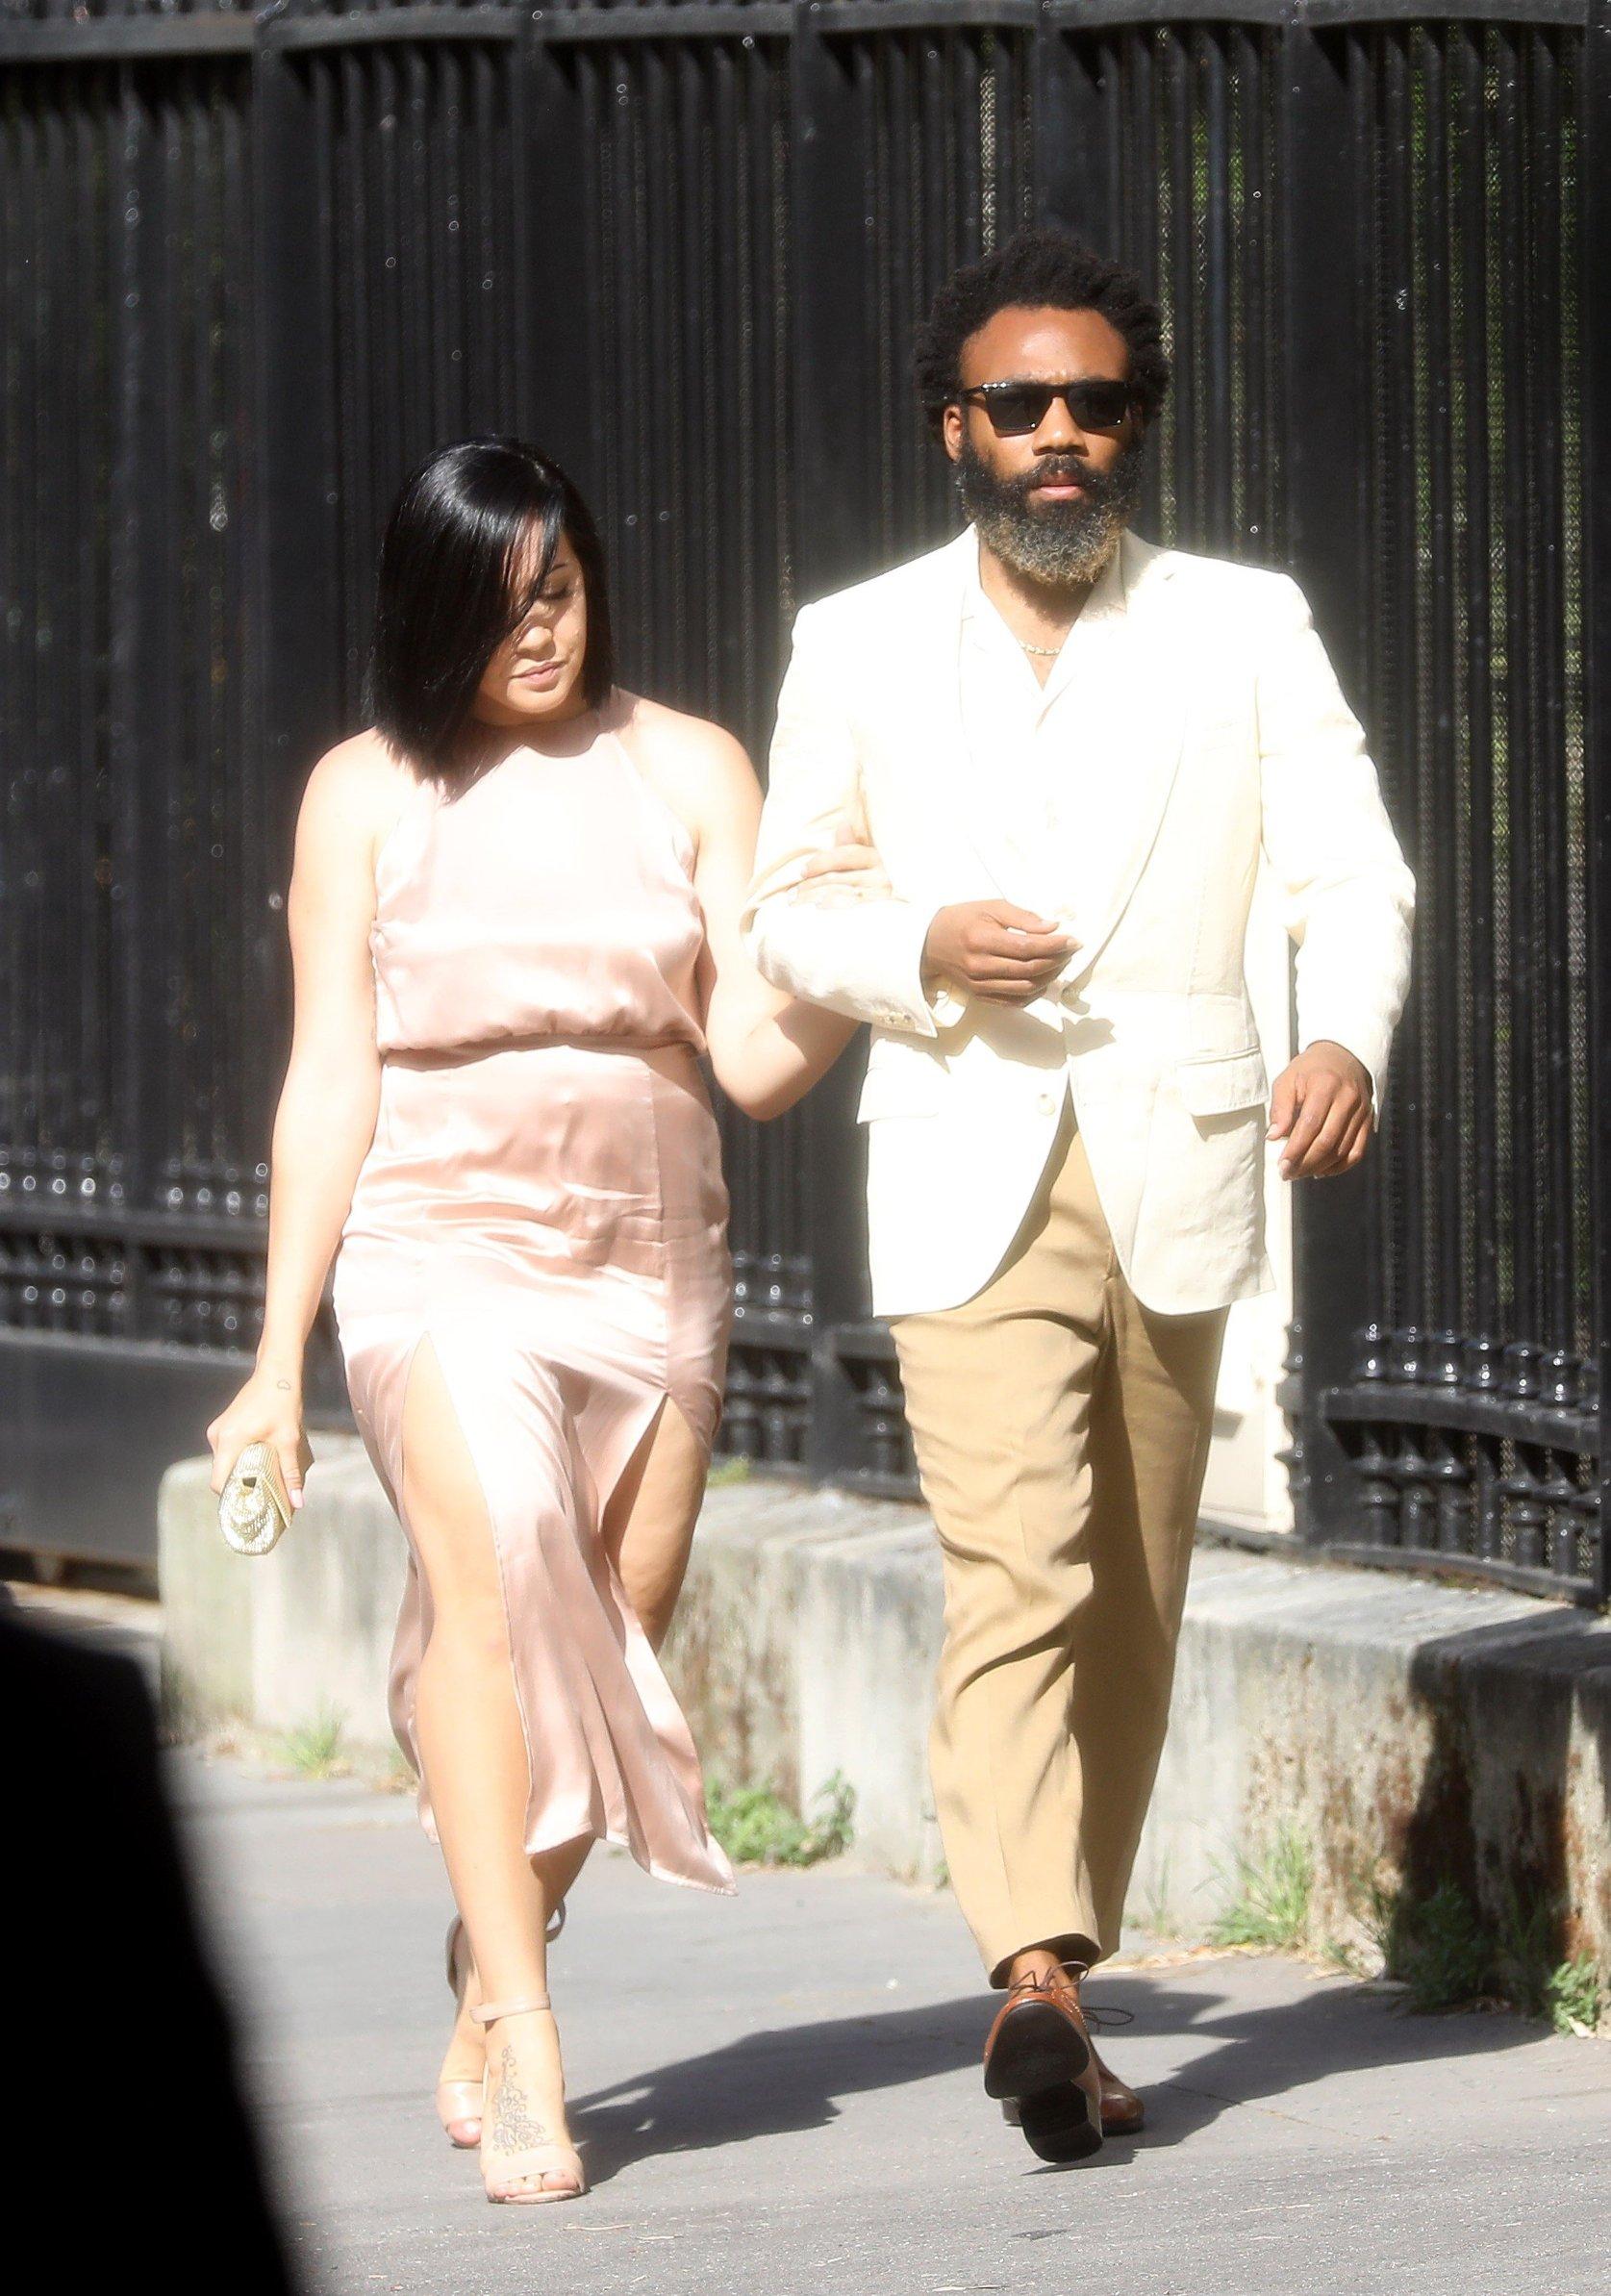 Zoe Kravitz Wedding with guests in the Lenny Kravitz parisian home Guests Paris le 29 juin 2019, Image: 452612292, License: Rights-managed, Restrictions: , Model Release: no, Credit line: Profimedia, KCS Presse